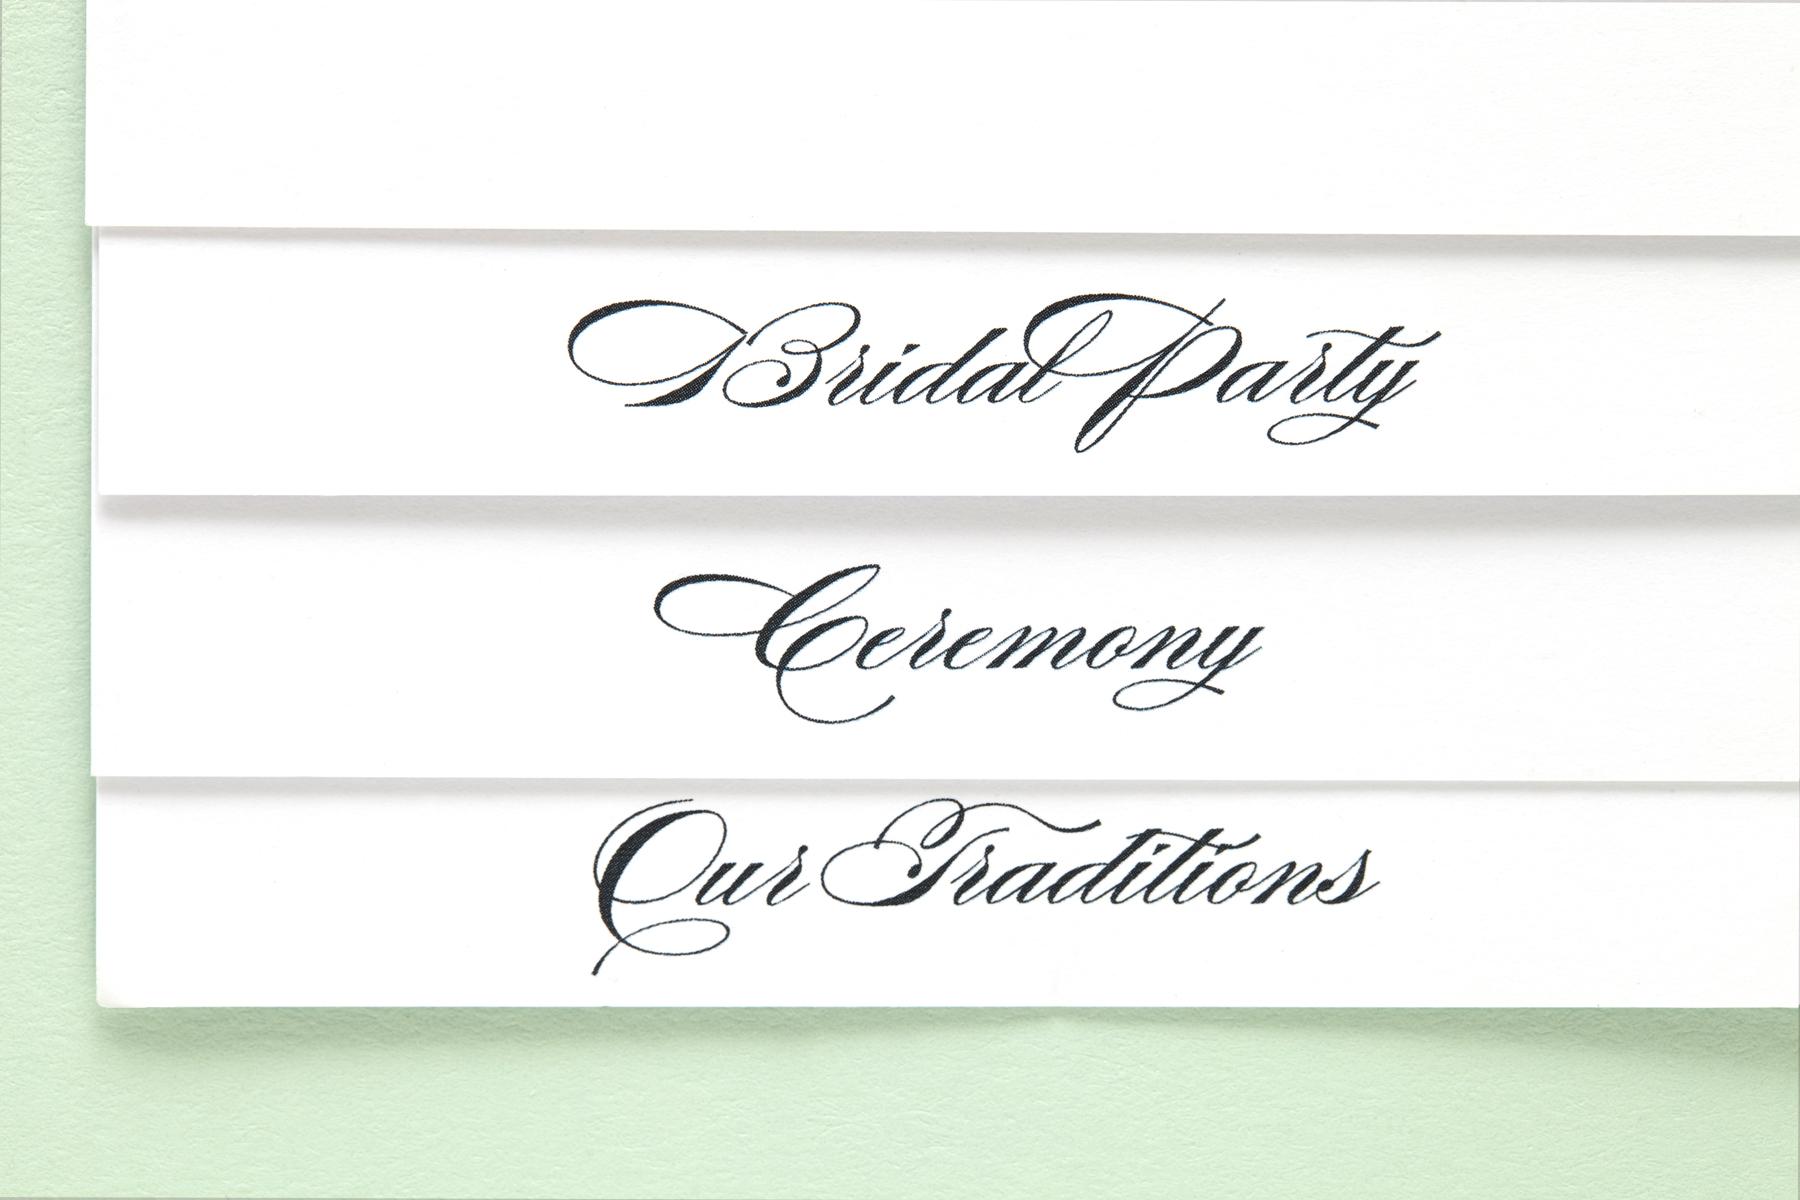 nautical inspired jewish wedding invitations sugar type 3 - Jewish Wedding Invitations